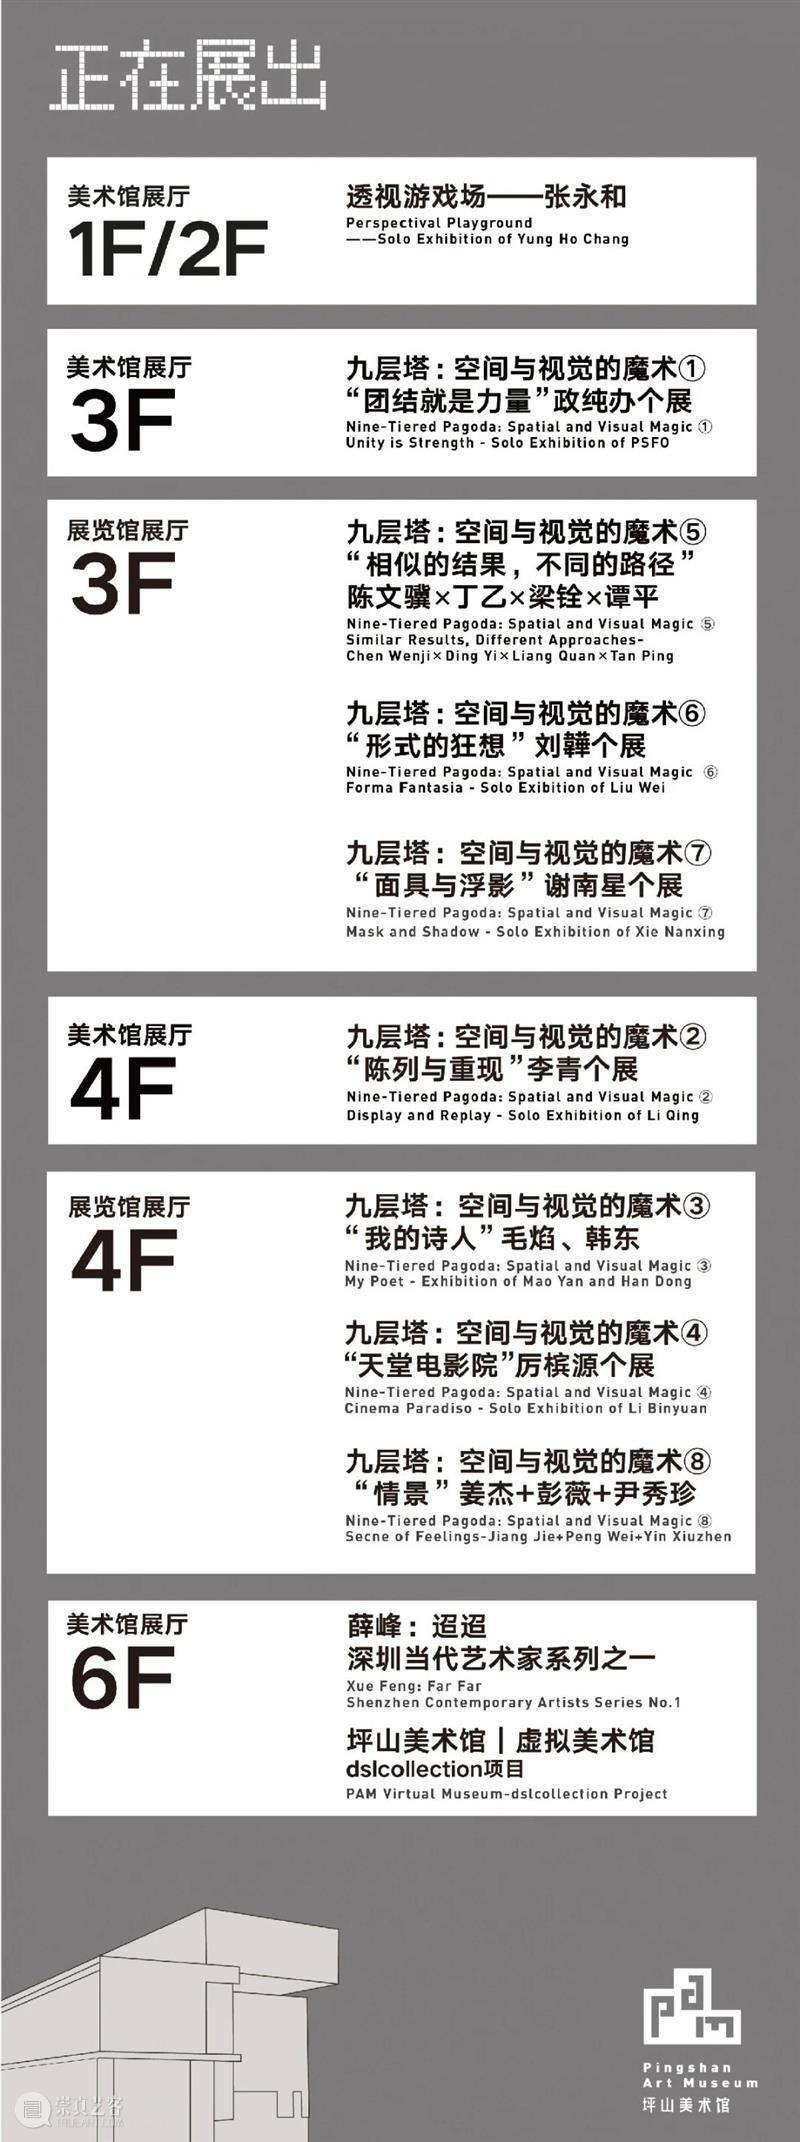 PAM四季学术沙龙回顾|刘晓都:克服空间弱点的过程,是美术馆新一轮的创造 刘晓都 学术 沙龙 美术馆 空间 过程 弱点 PAM 坪山美术馆 馆长 崇真艺客